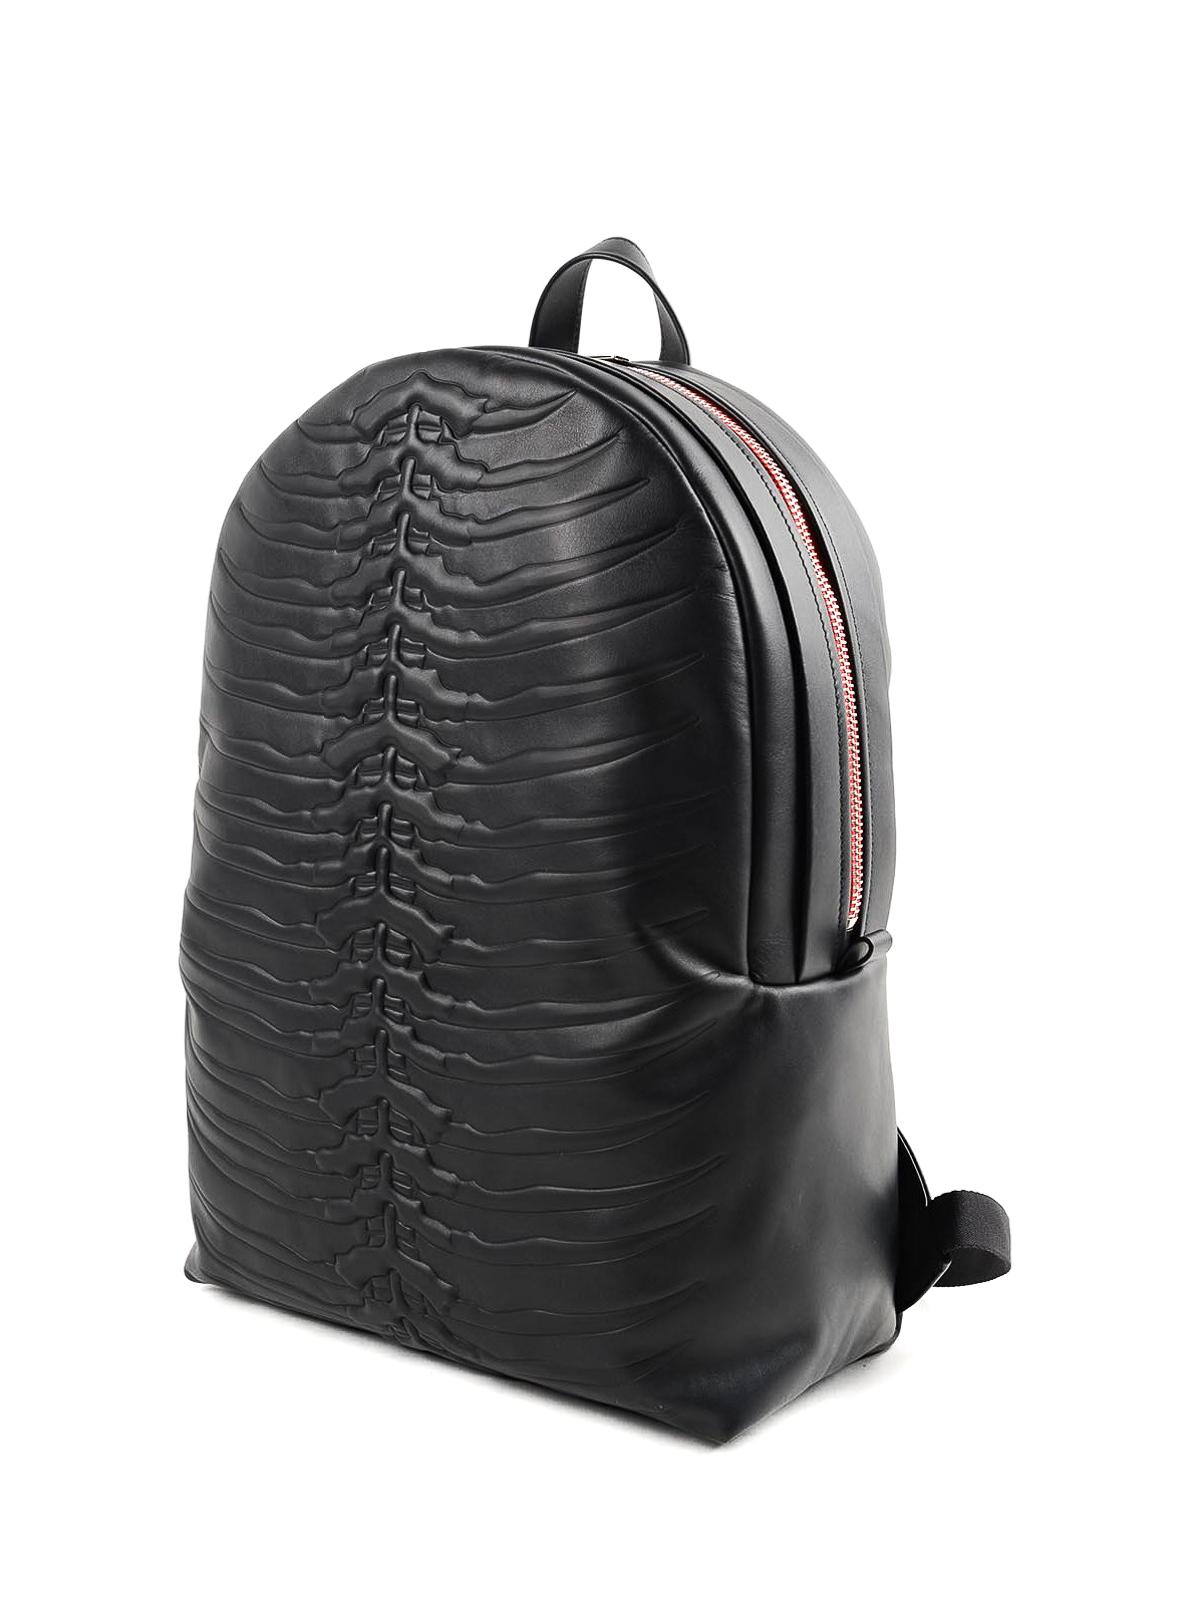 Children Boys Cool Backpacks Schoolbag Punk Skull Printed